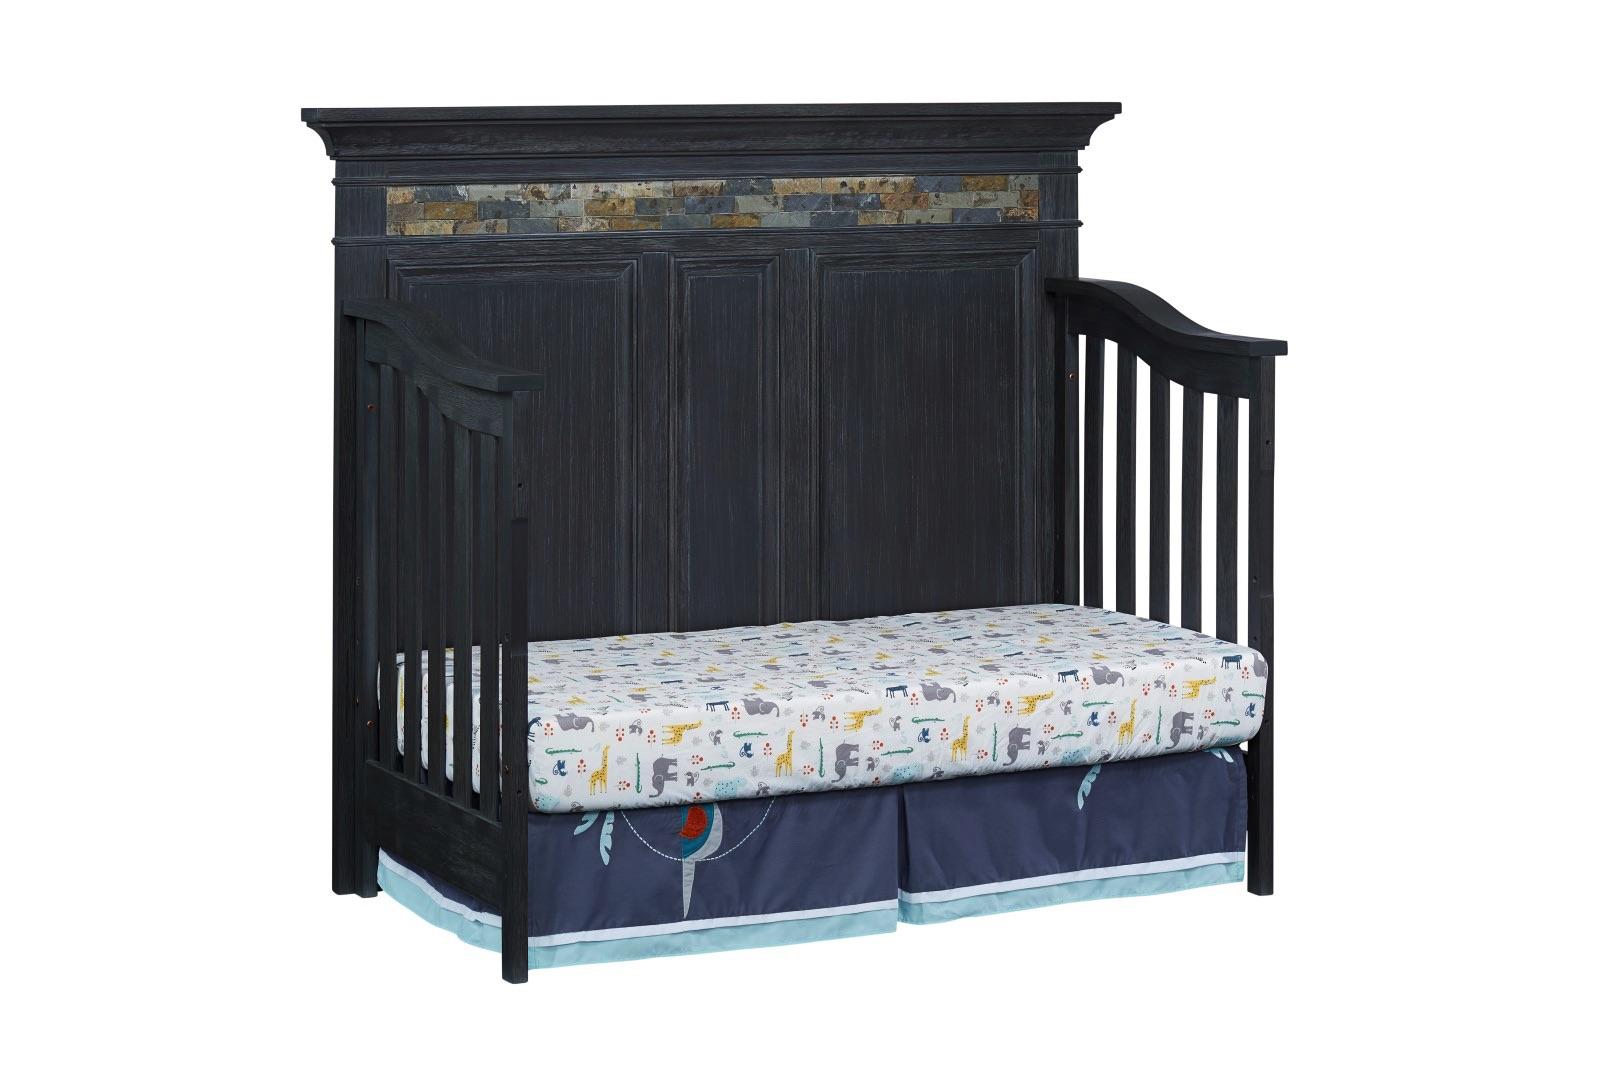 4 in 1 Convertible Crib - Stone Hill - Smoke Gray | Soho Baby